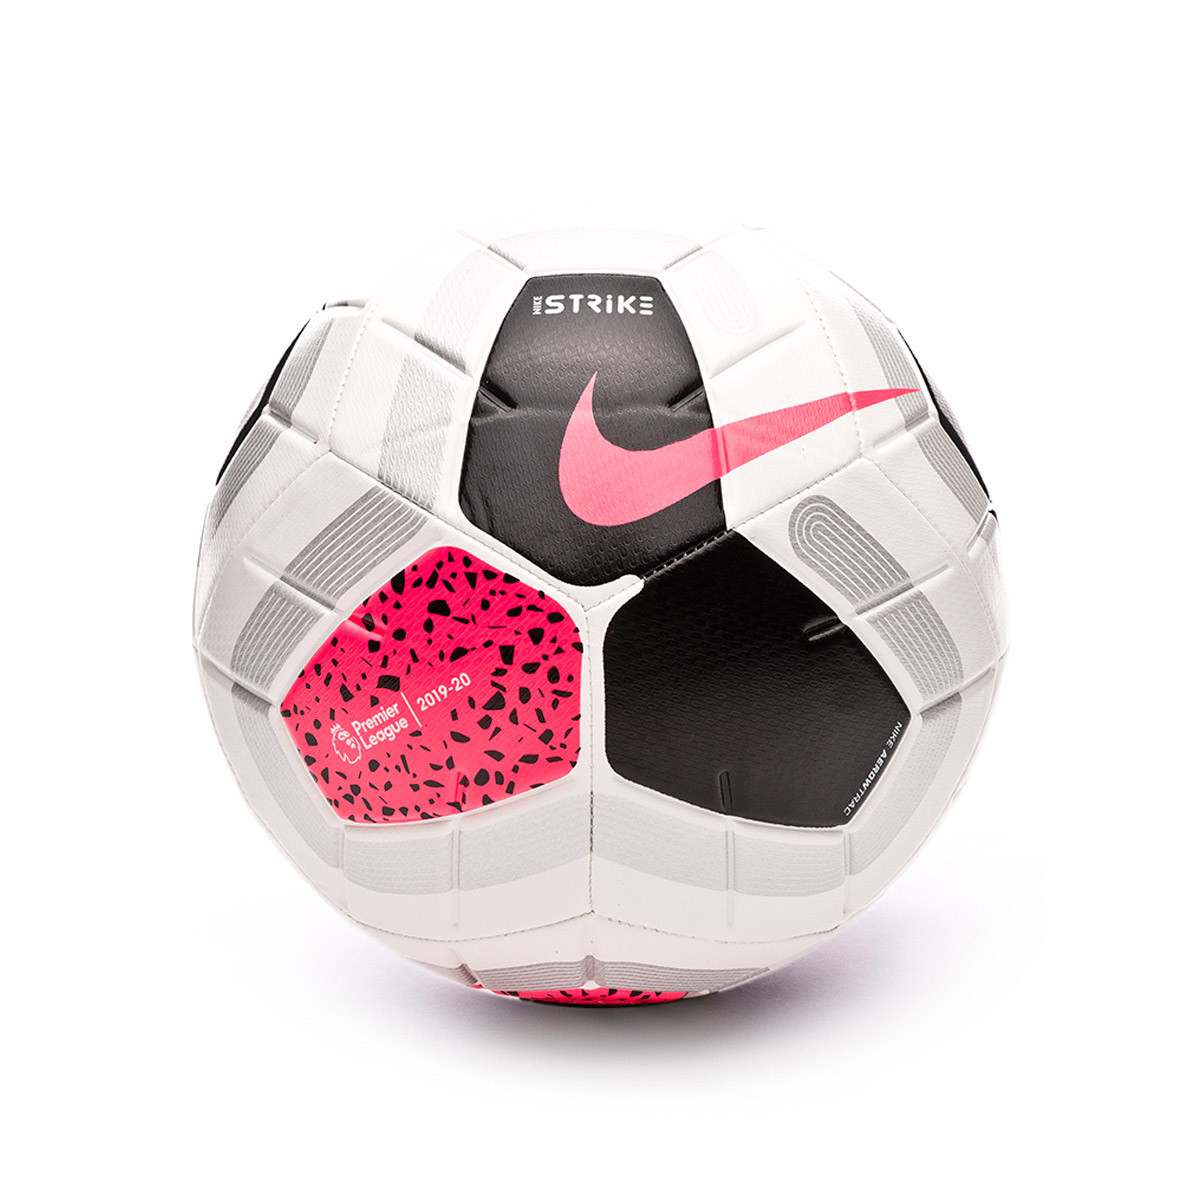 Bola de Futebol Nike Premier League Strike 2019 2020